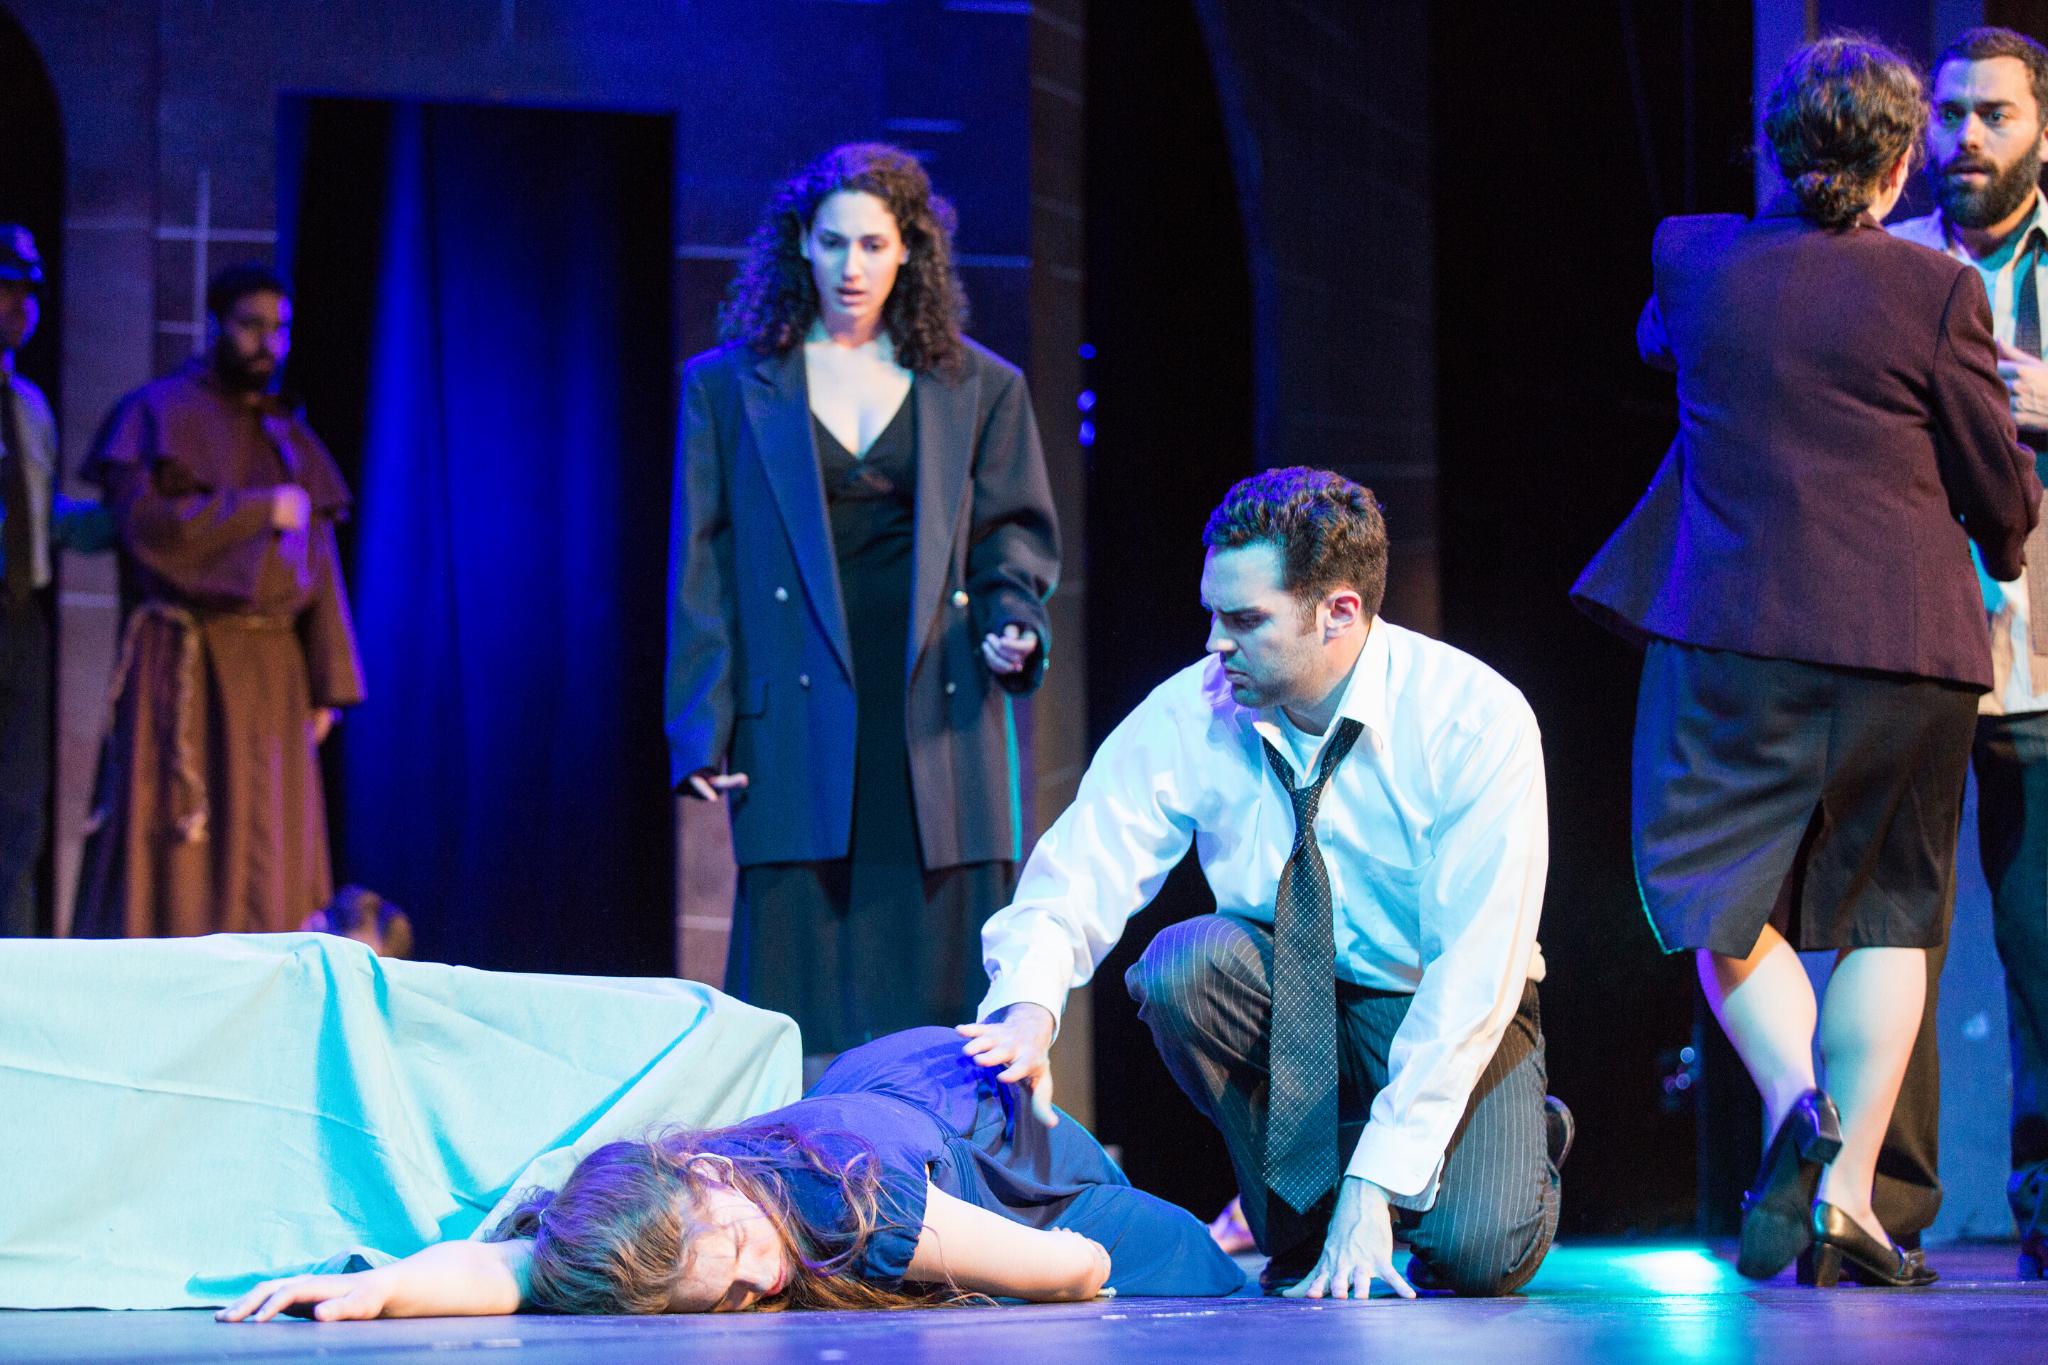 Charlotte Kinder (Juliet), Sophia Blum (Lady Capulet), and Brennan Lowery (Lord Capulet) in Romeo & Juliet, CSC2, 2015-Photo by Nile Hawver